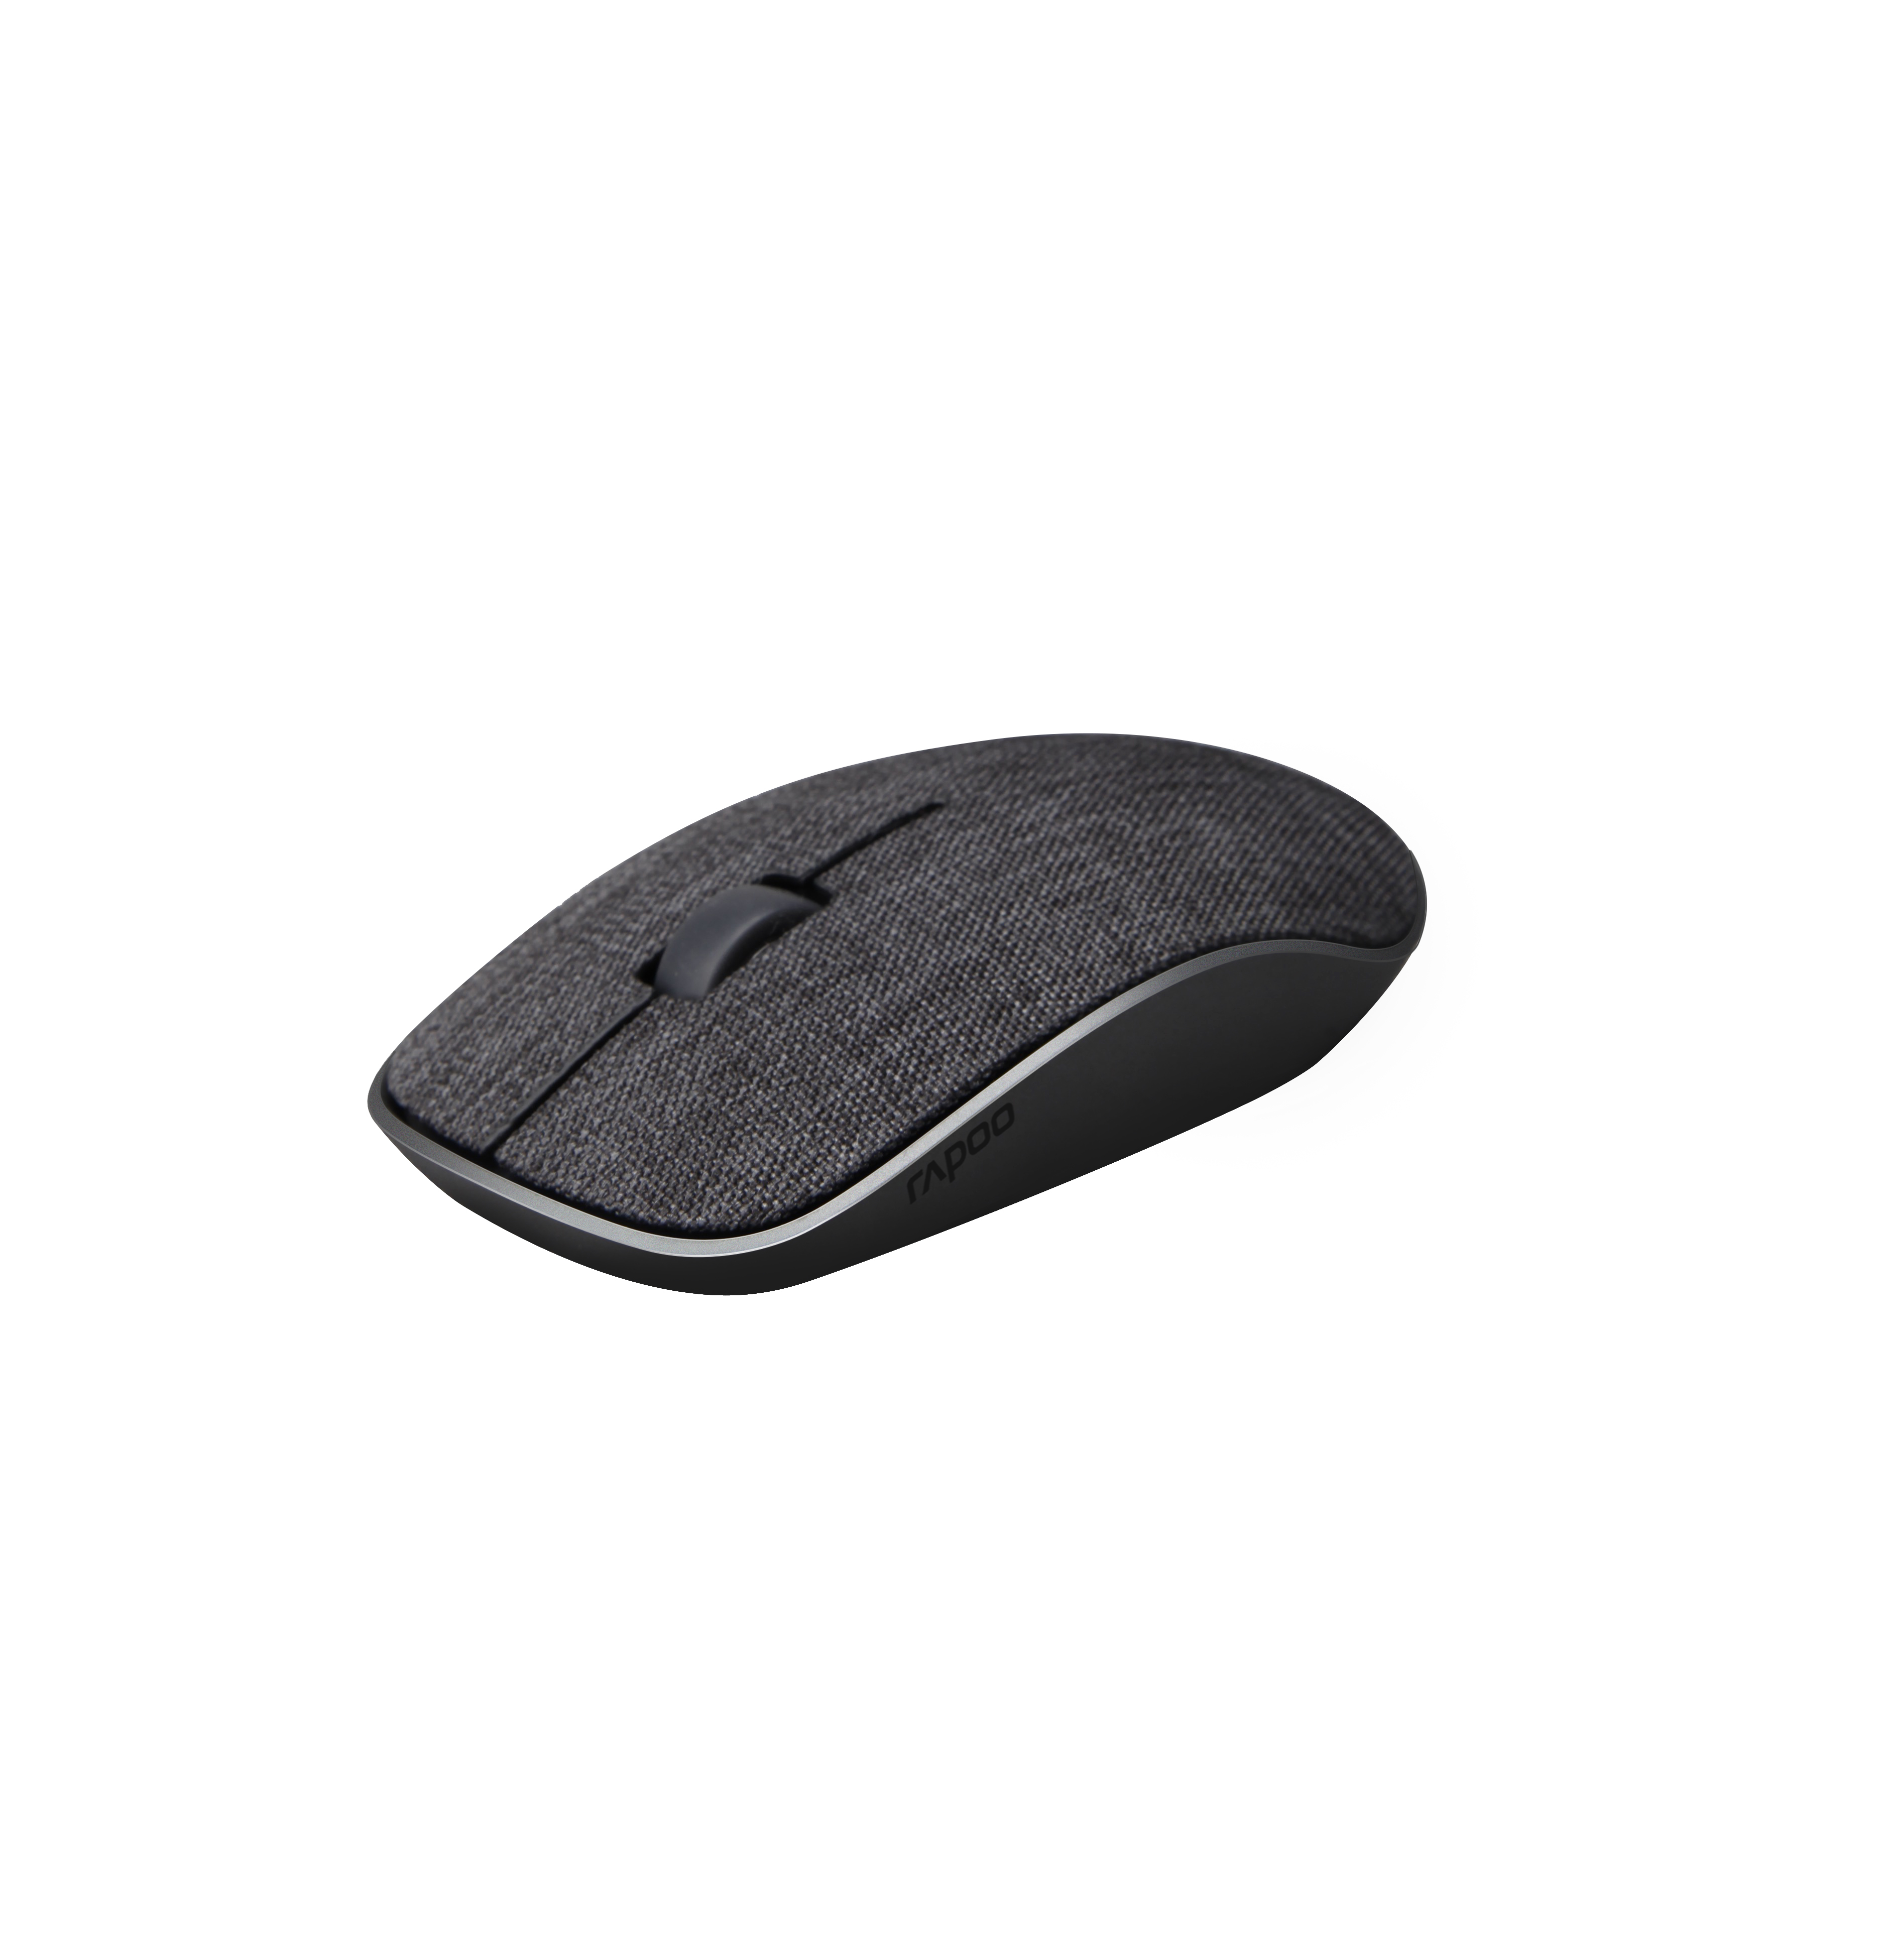 Rapoo Fabric 3510 Plus Black Wireless Mouse